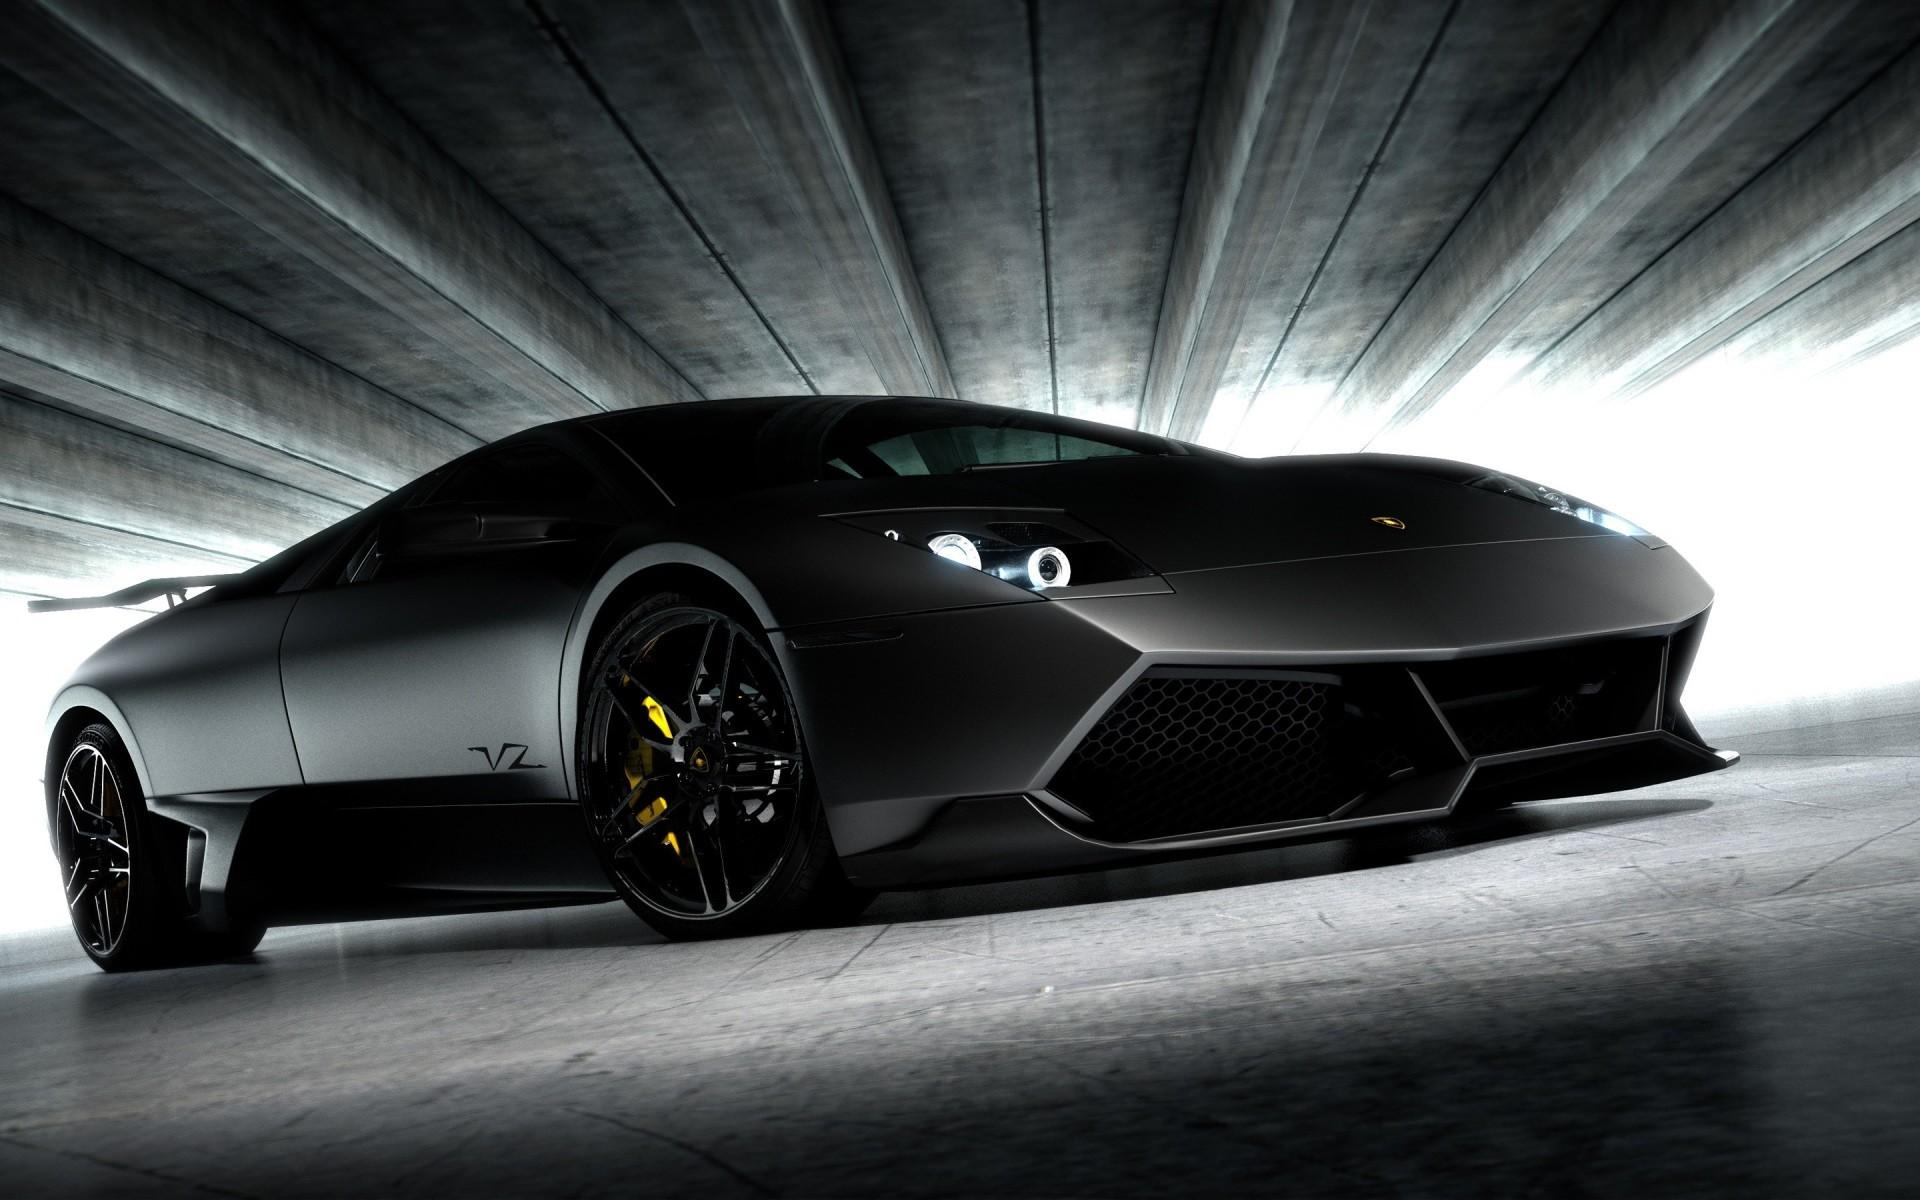 Black Lamborghini Wallpaper (72+ images)